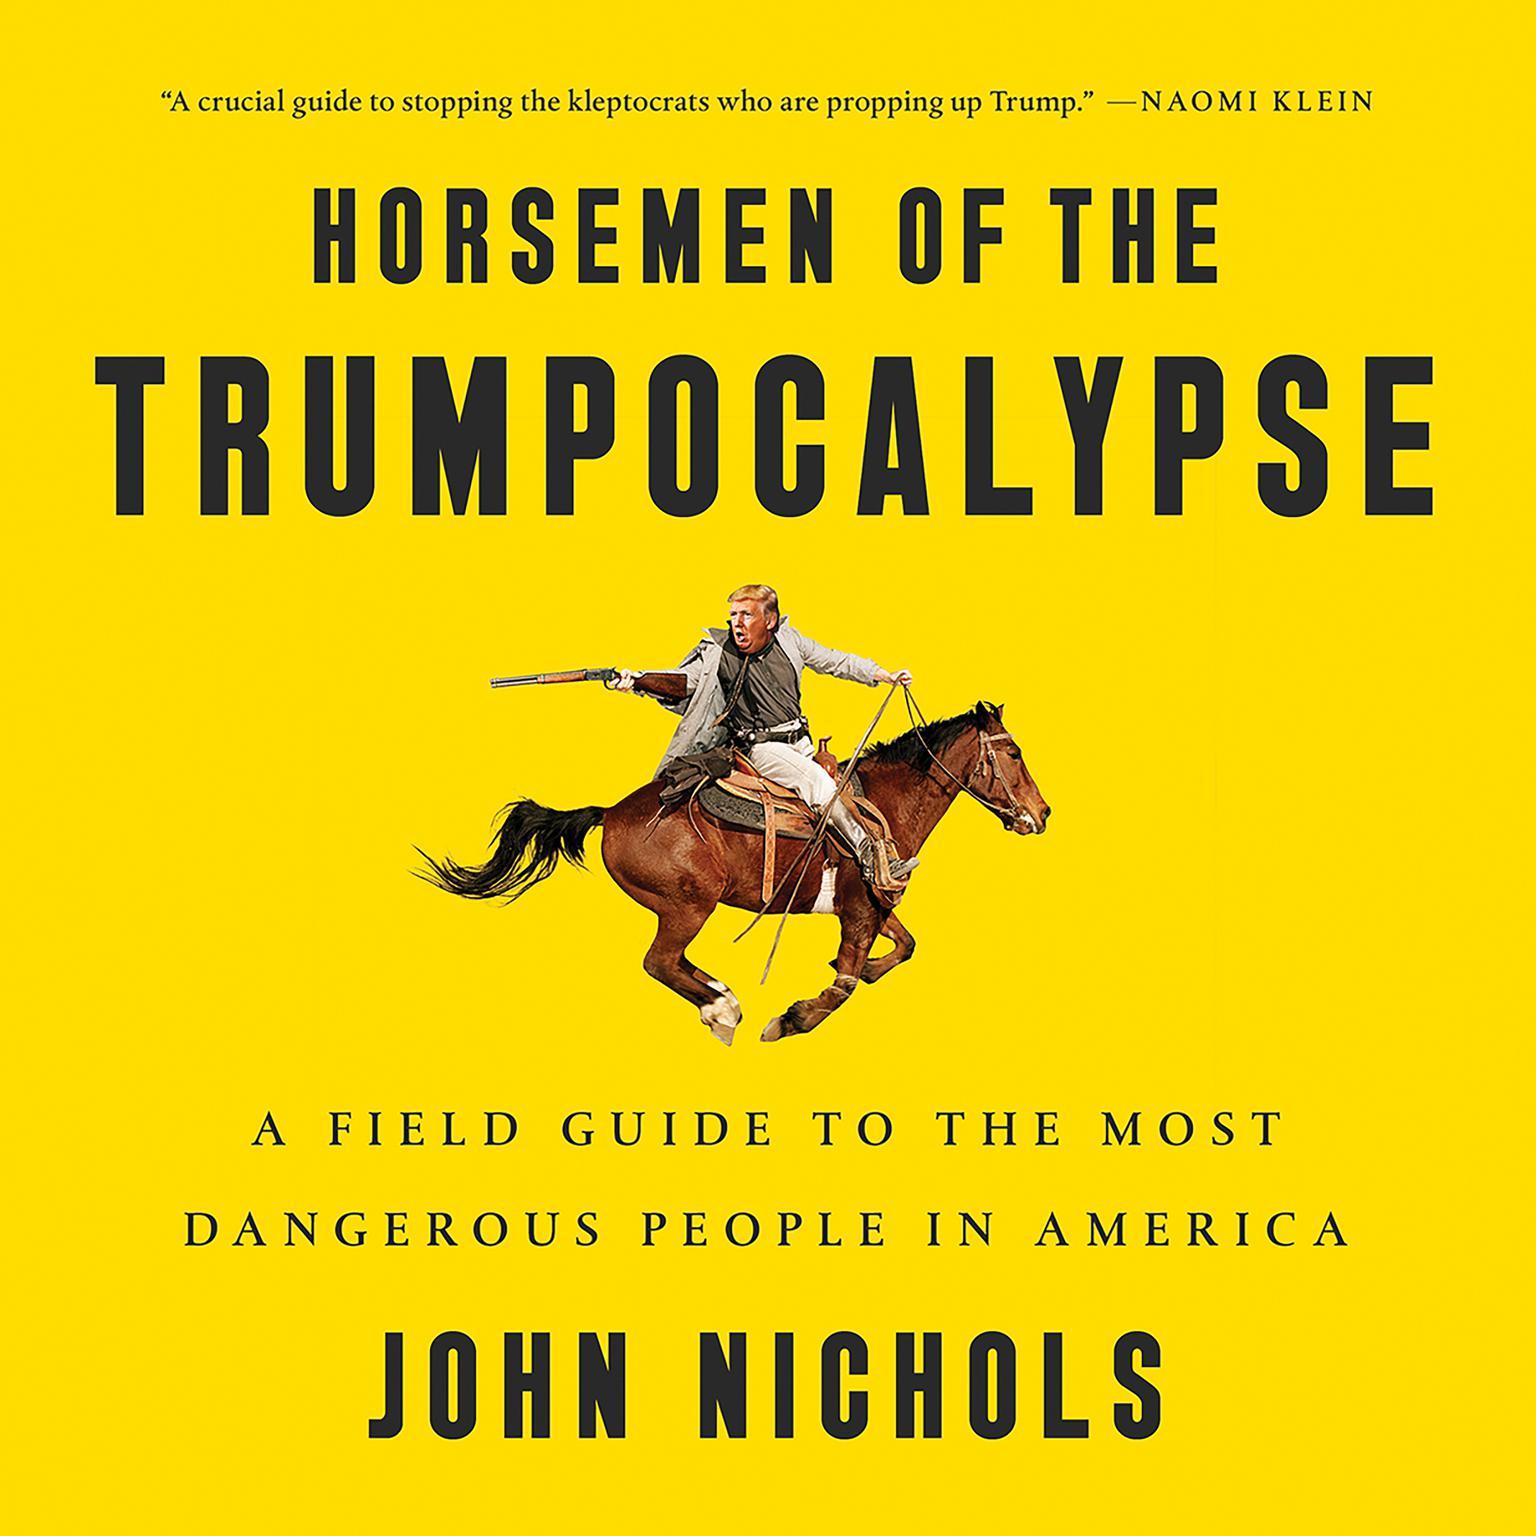 Horsemen of the Trumpocalypse: A Field Guide to the Most Dangerous People in America Audiobook, by John Nichols